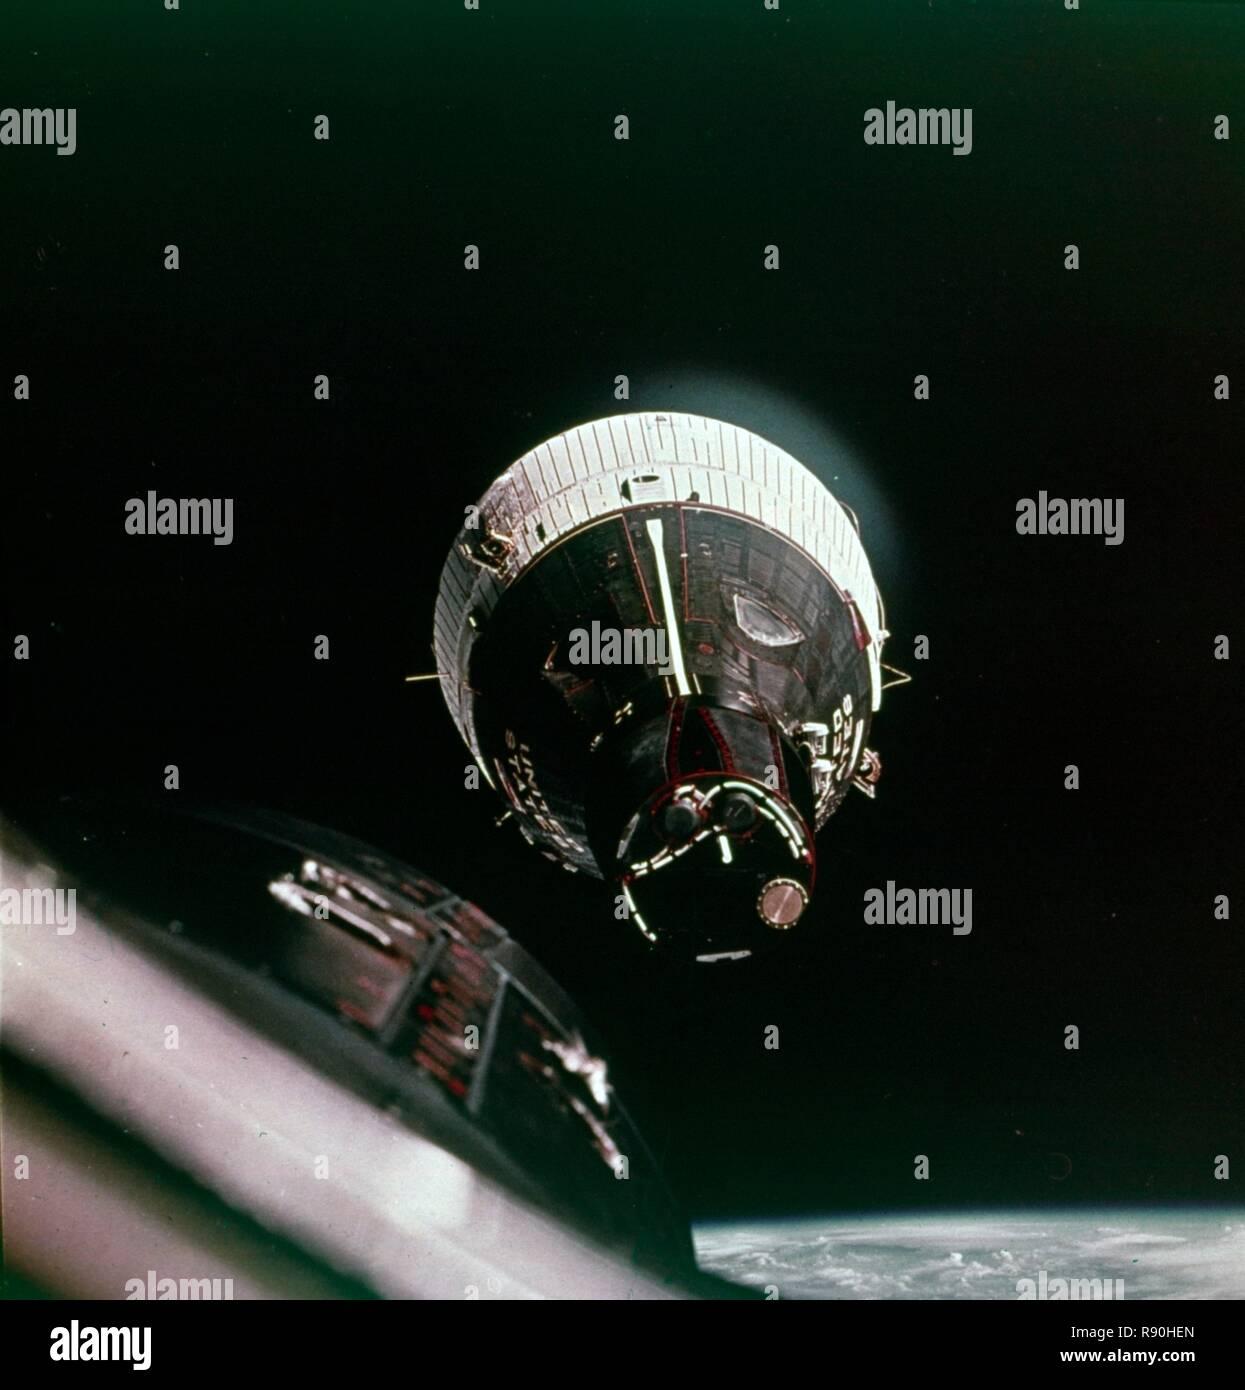 Gemini 6 1965 Stock Photos Gemini 6 1965 Stock Images Alamy